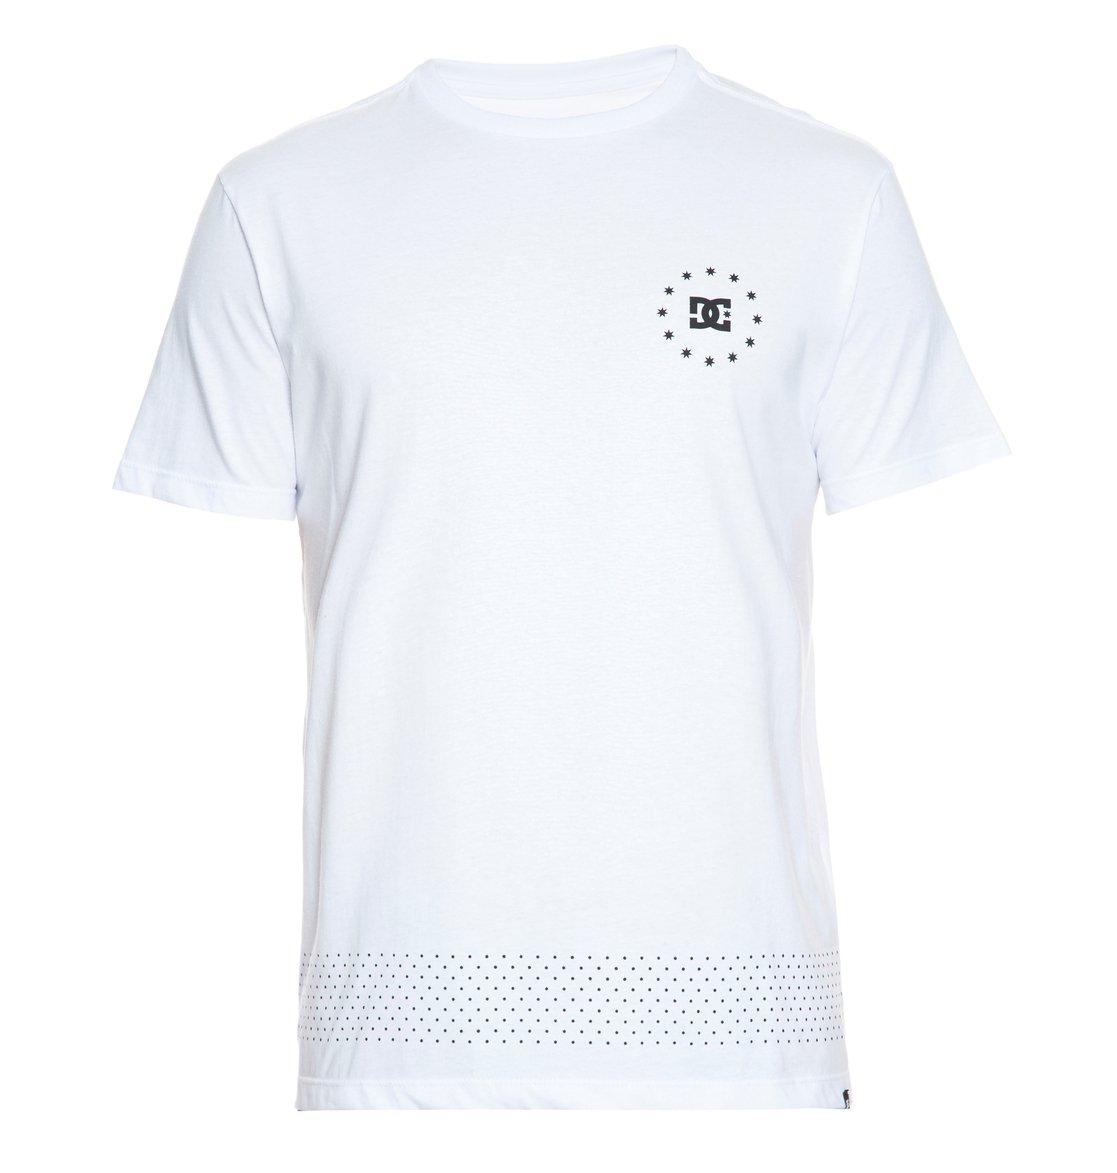 0 Camiseta básica m c masculina Kalis 07 BR61113787 DC Shoes b8fa62baff4